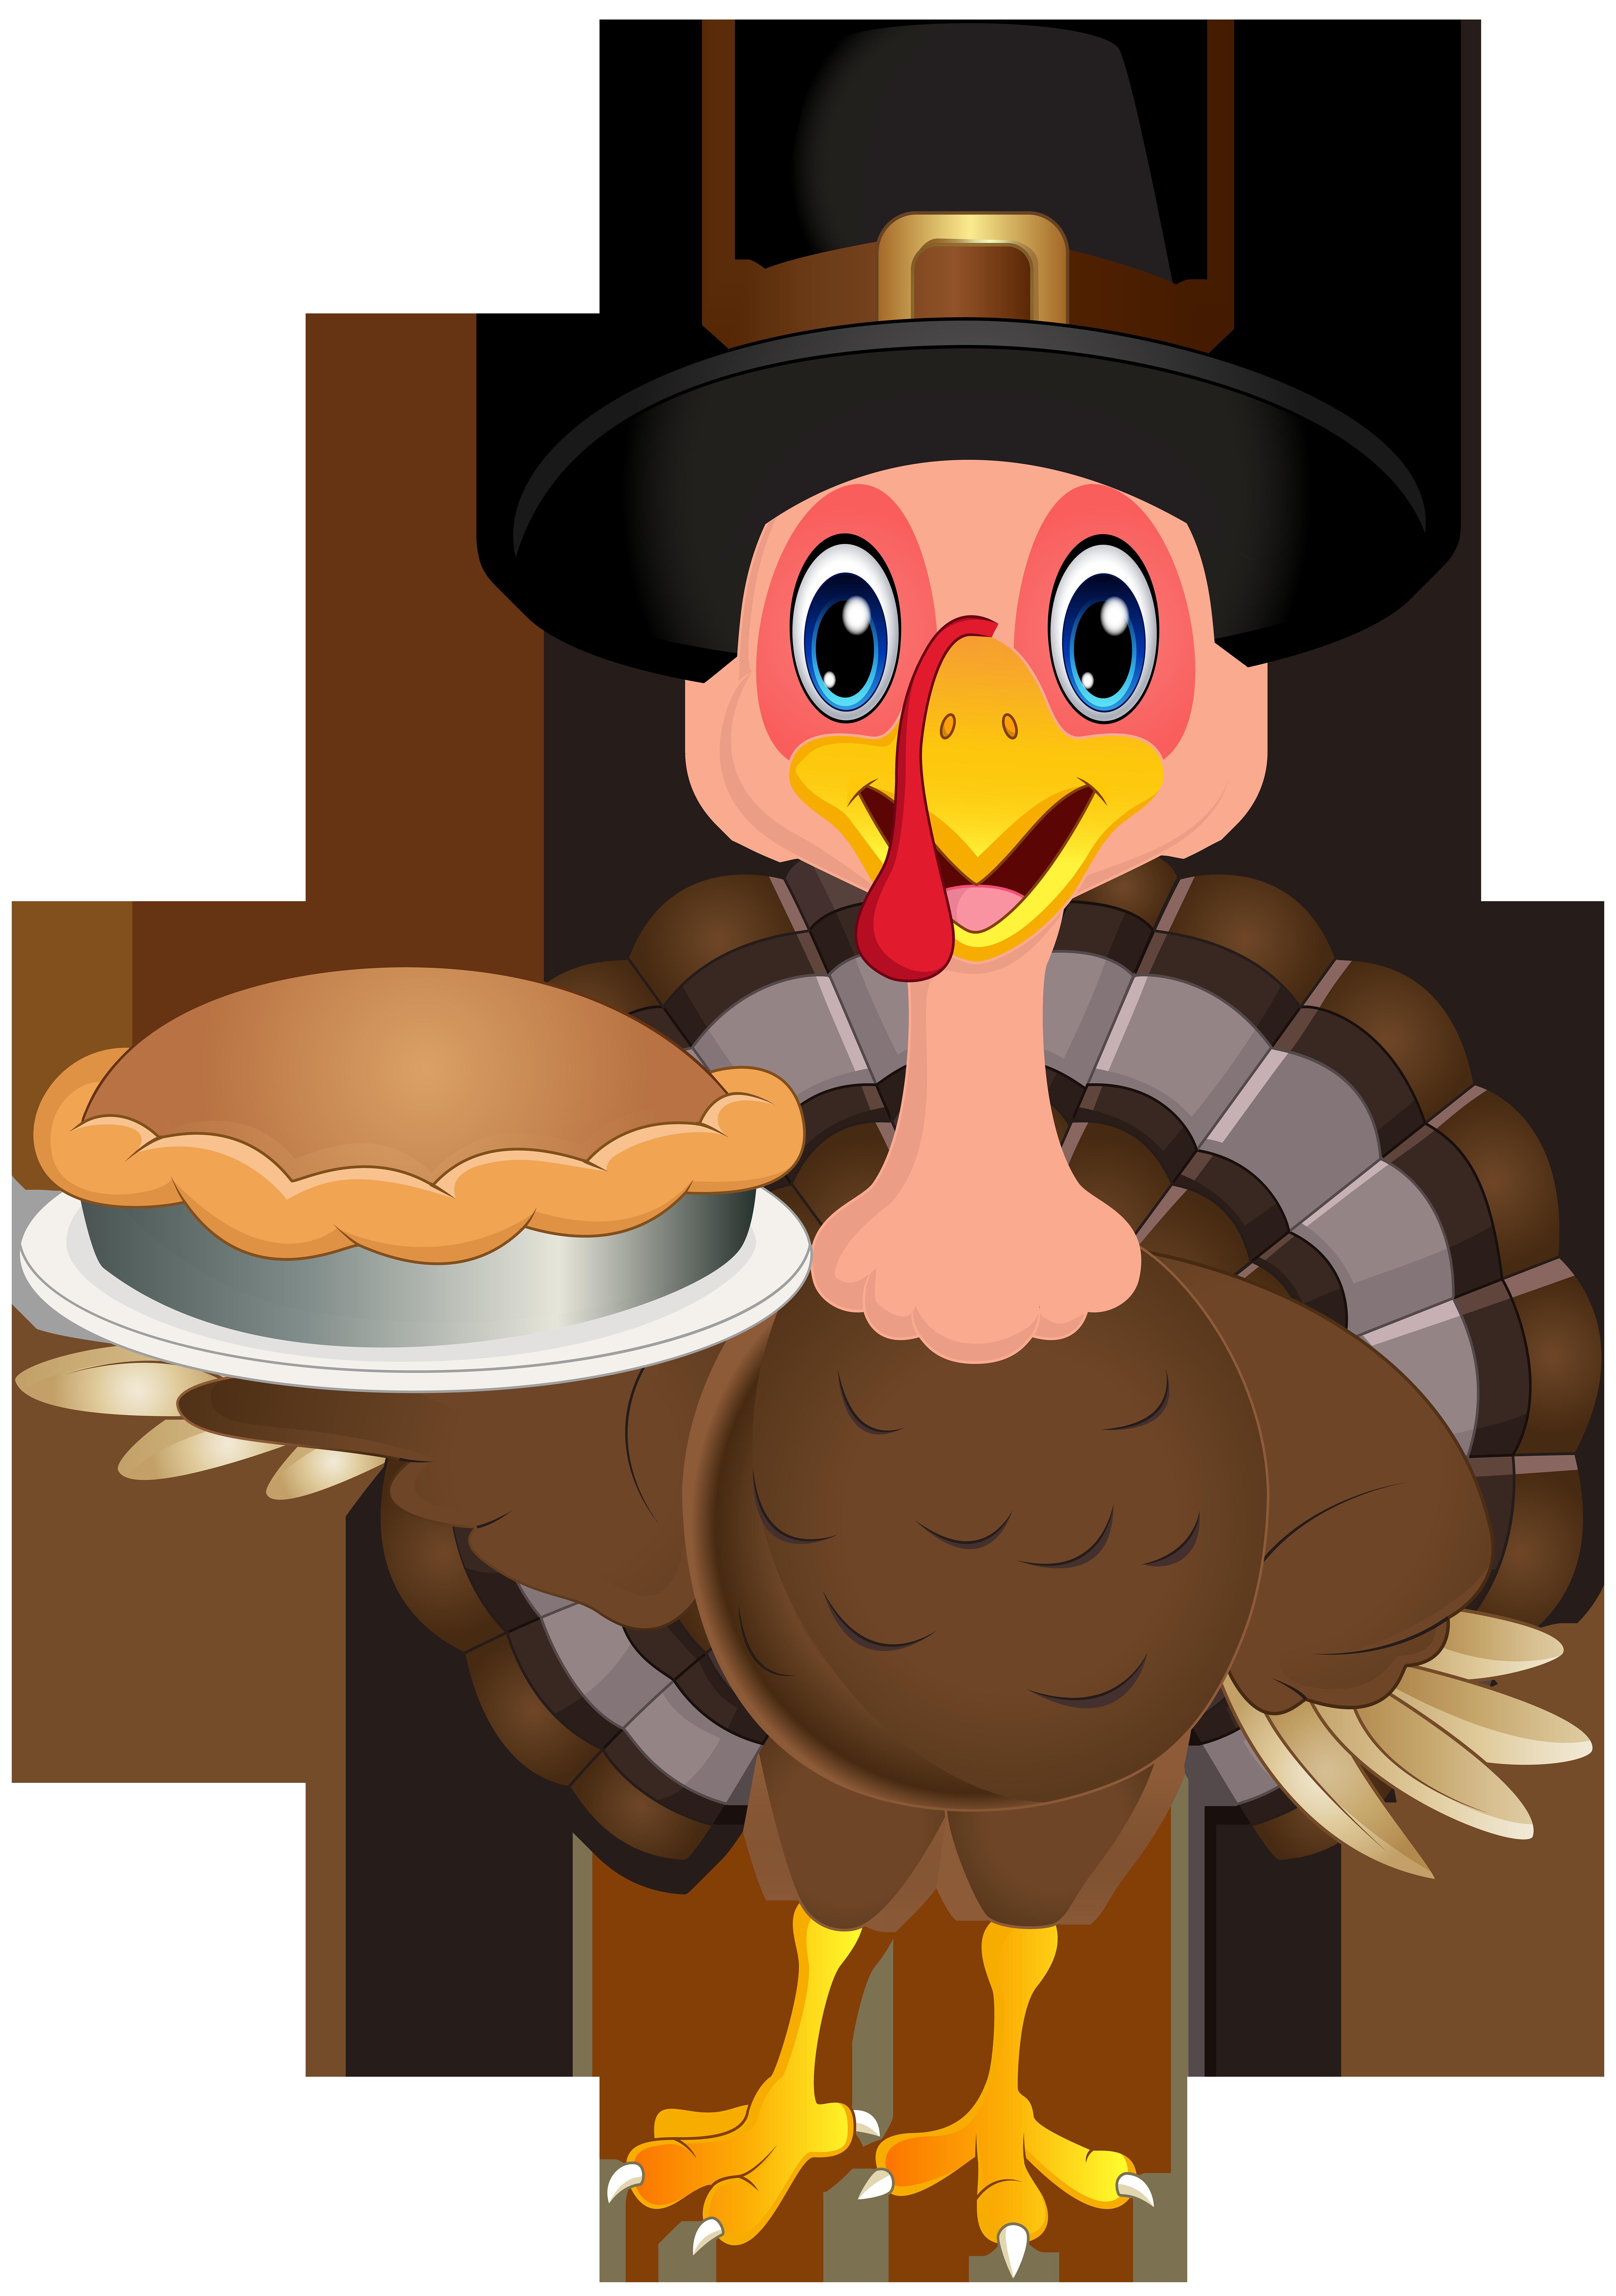 Thanksgiving Cute Turkey PNG Clip Art Image.